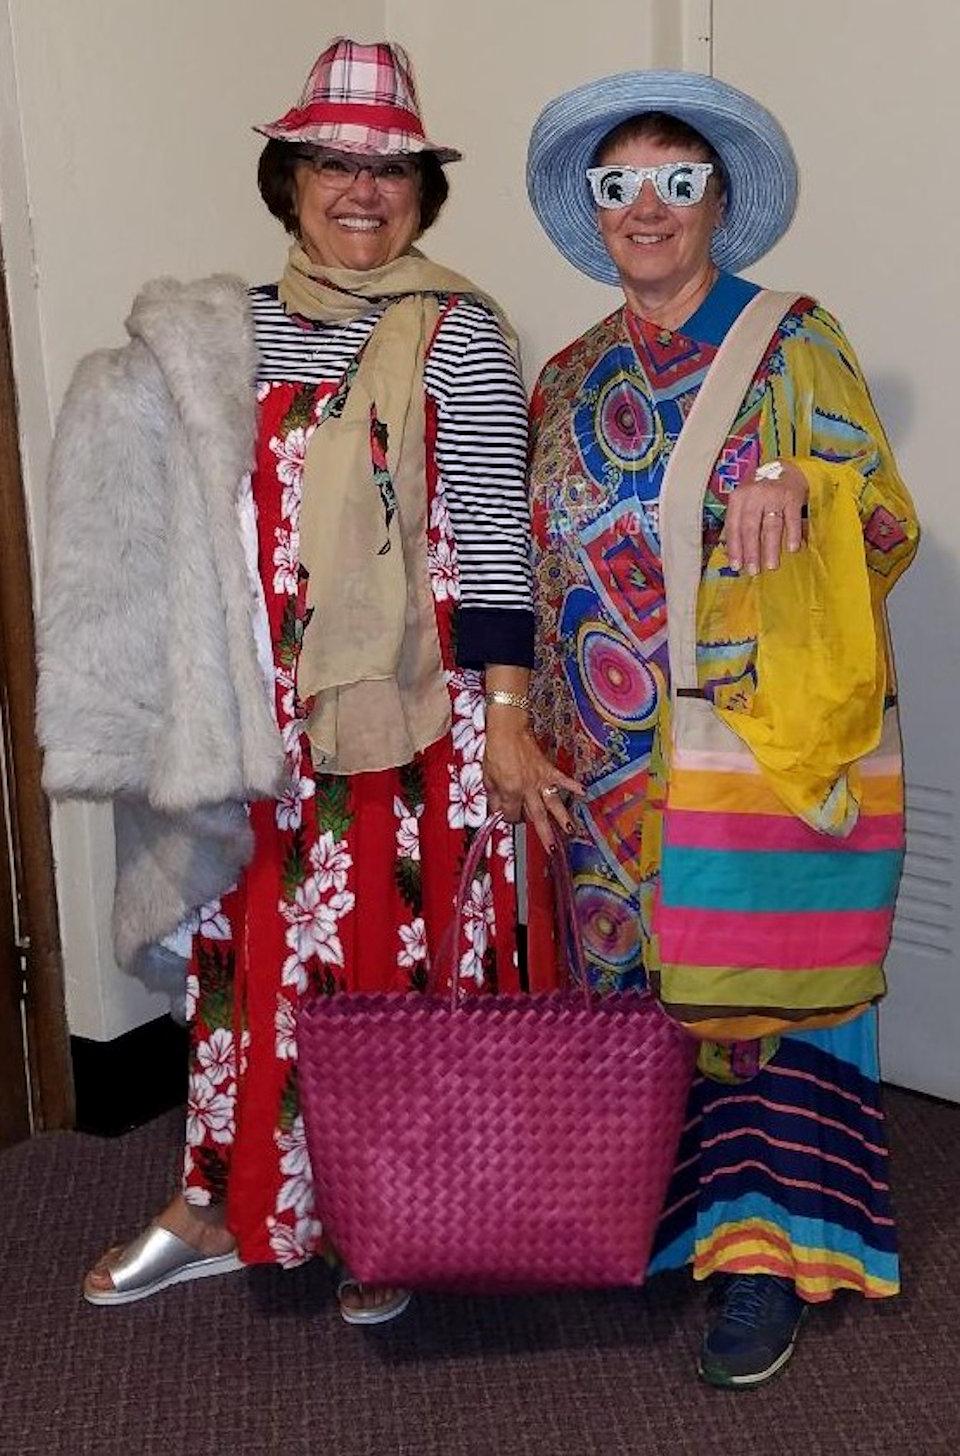 Women at Rummage Sale